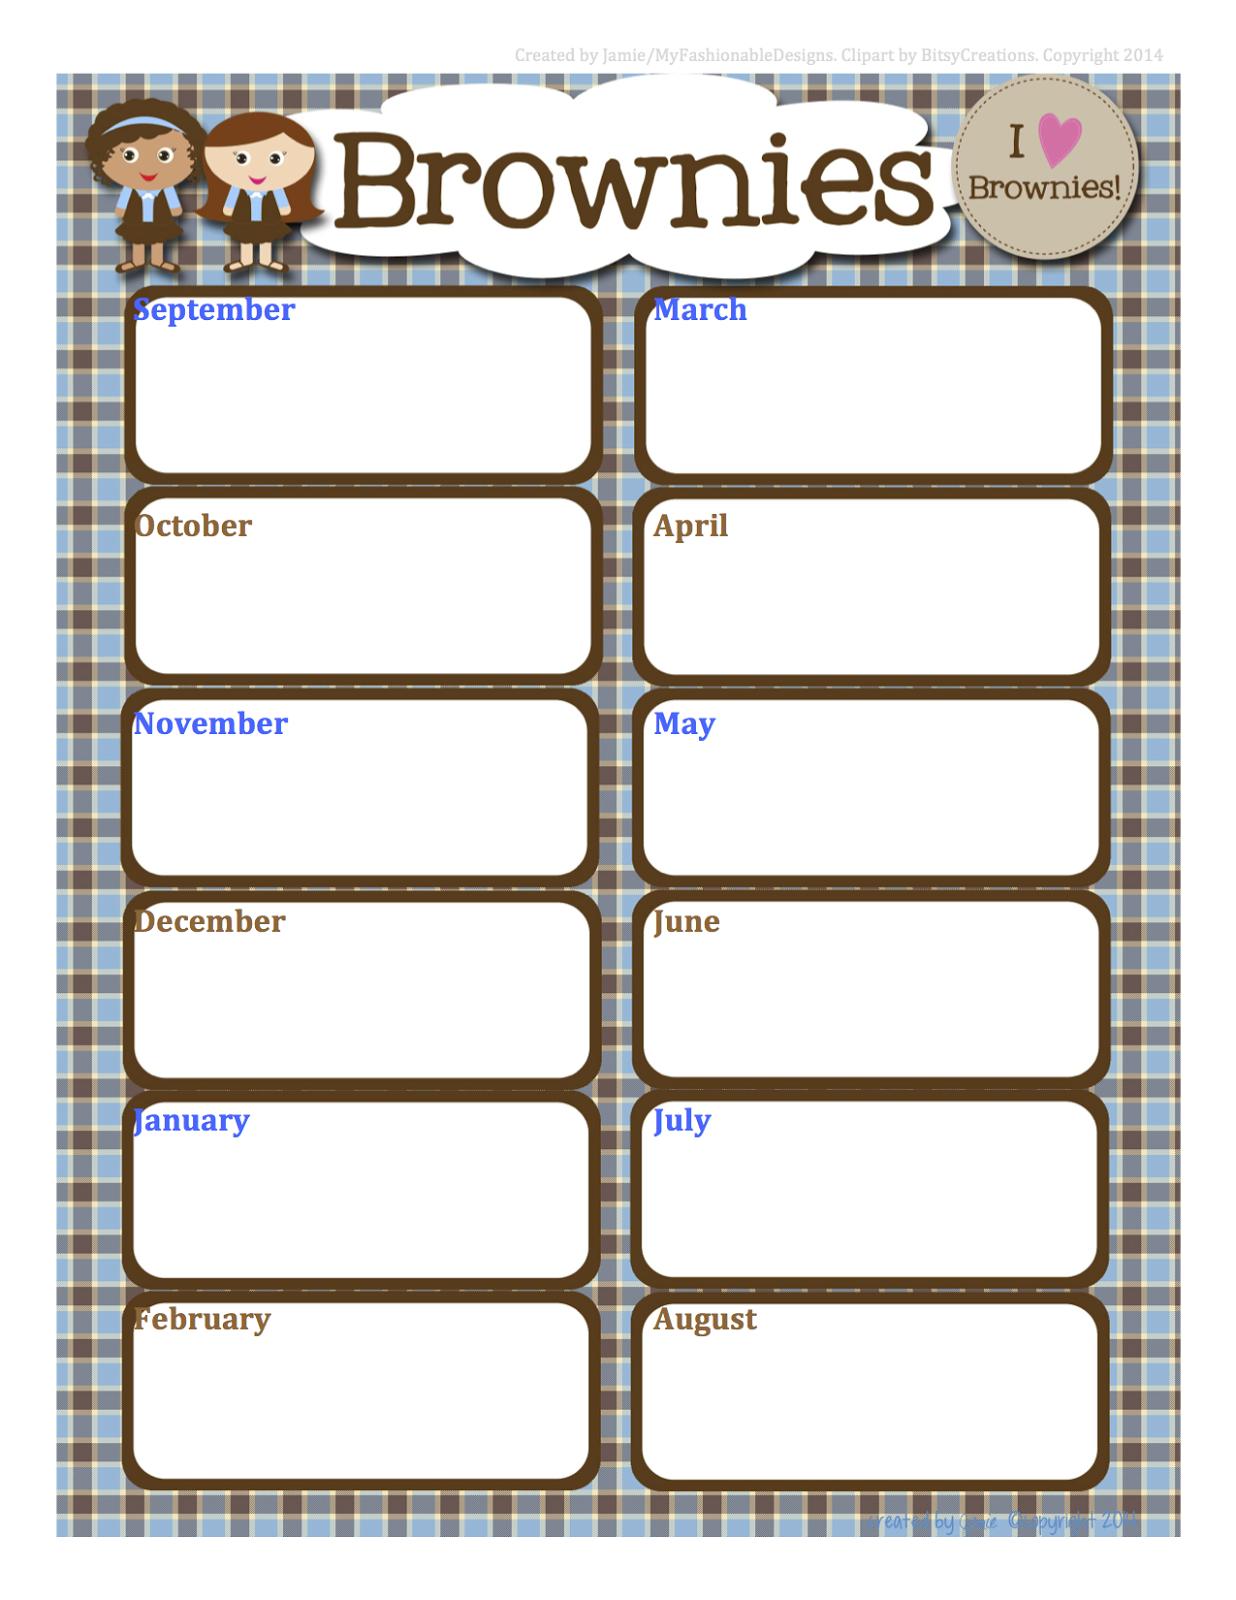 Girl Scout Cookie Goal Worksheet